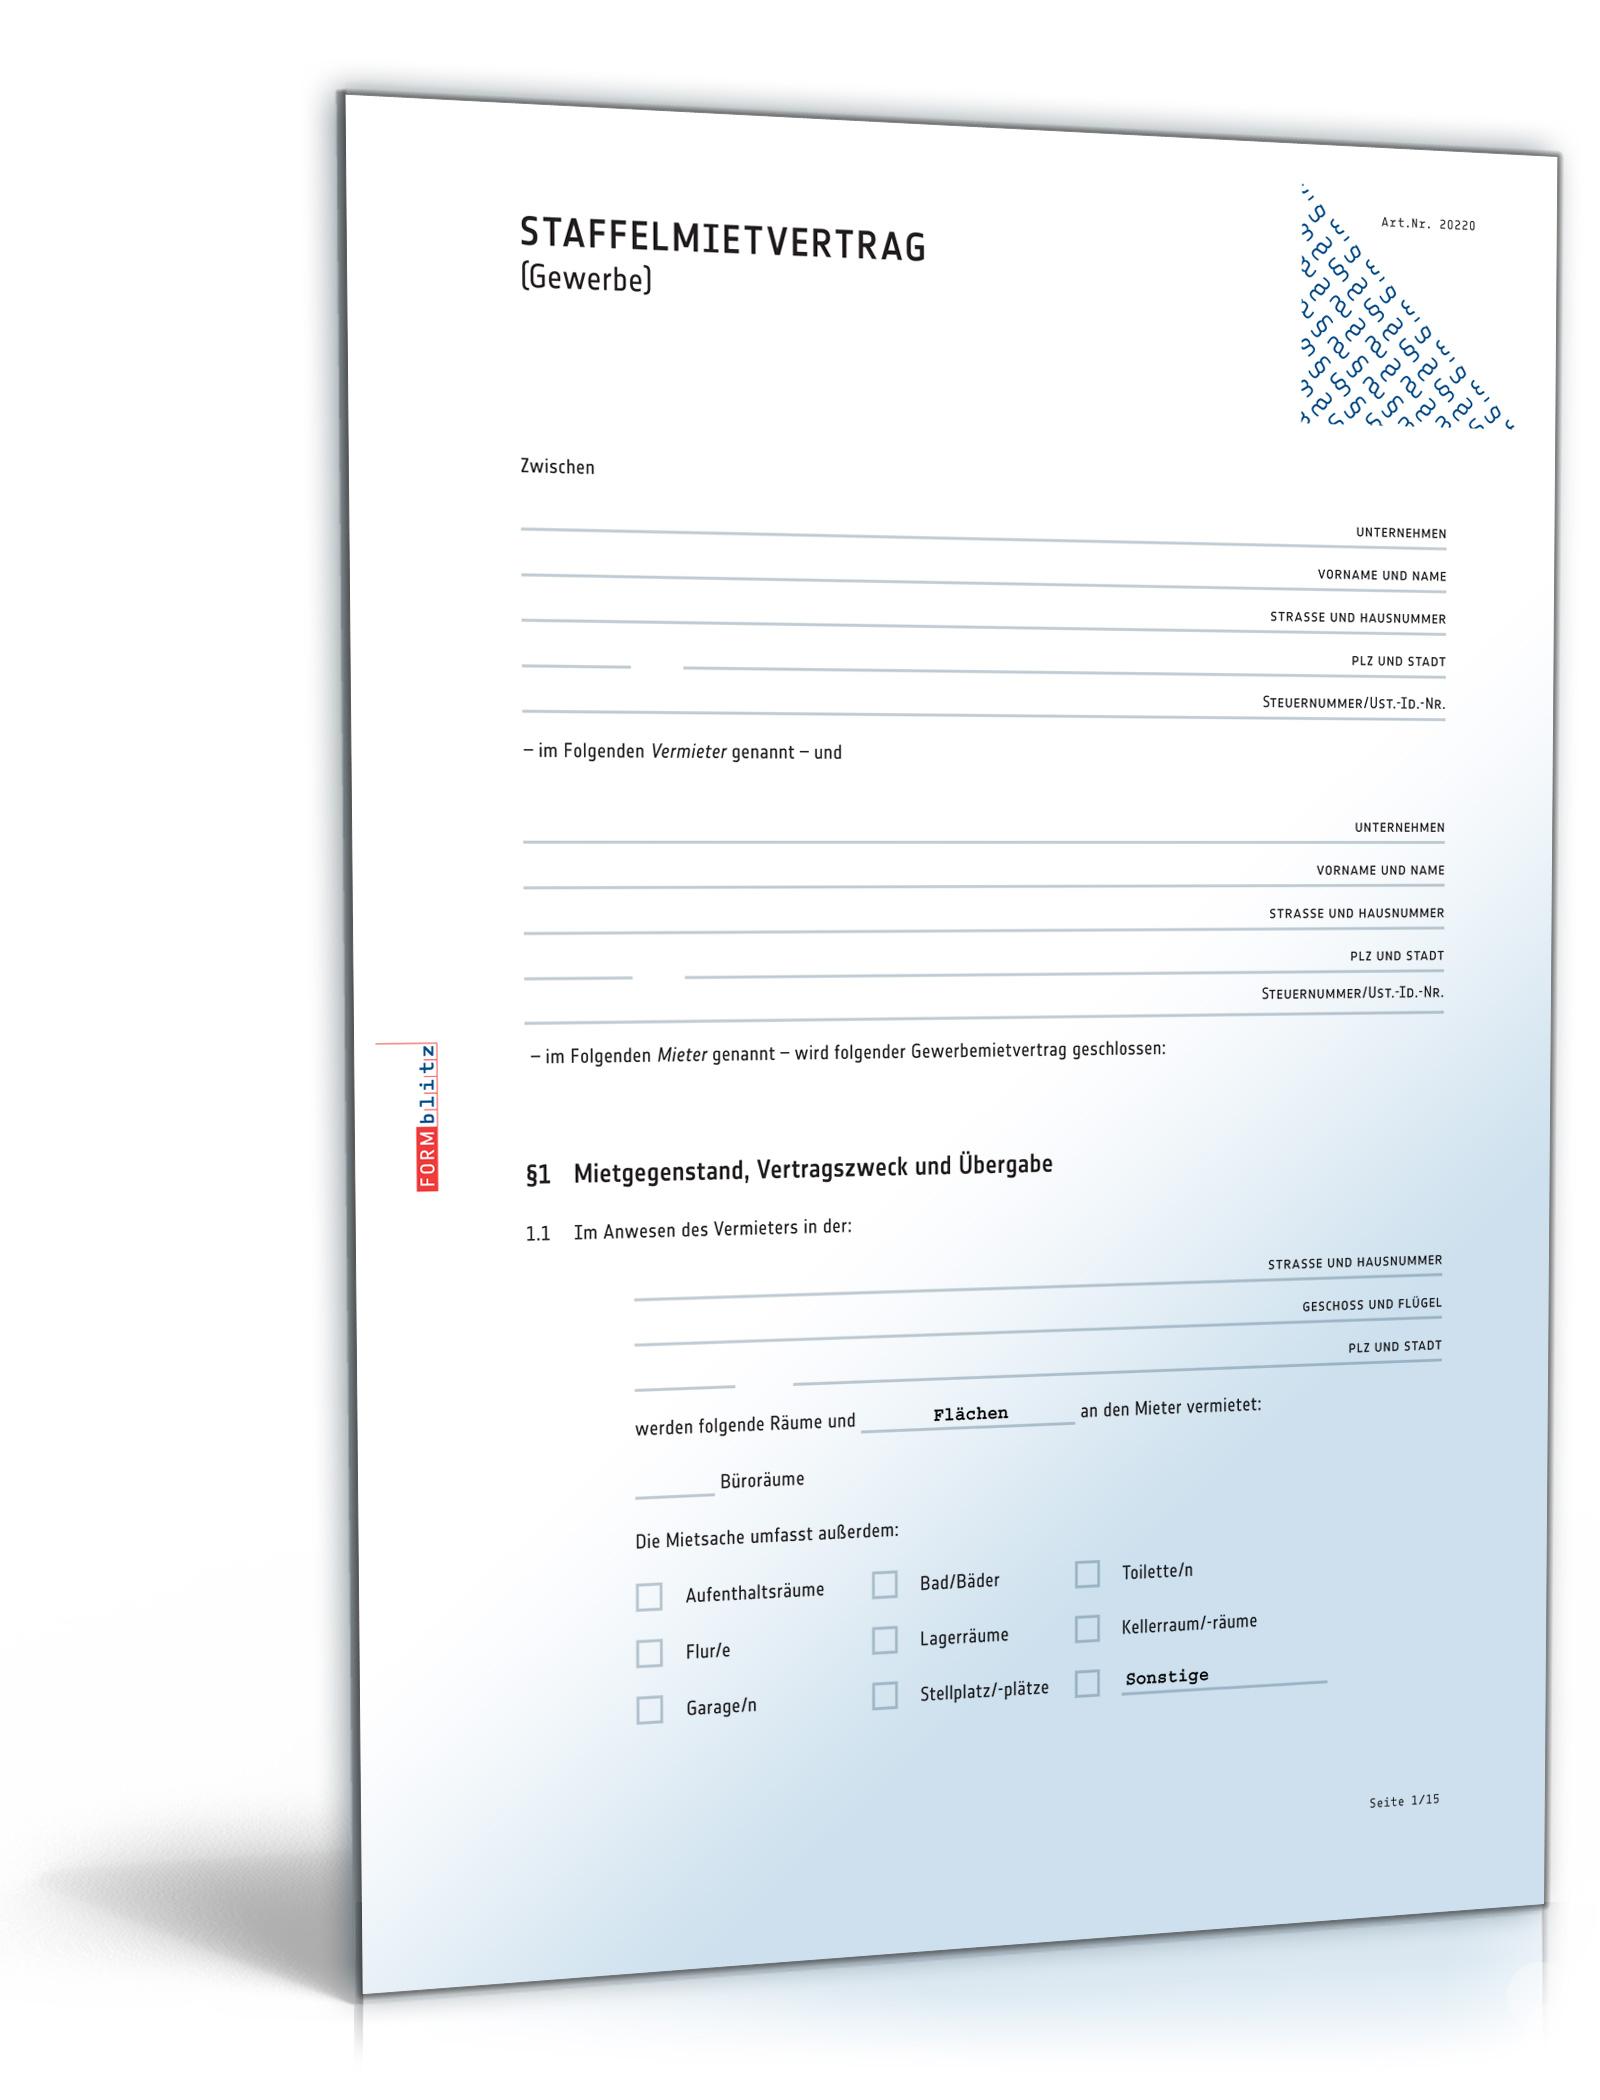 Staffelmietvertrag Gewerbe [PDF Download]: Amazon.de: Software